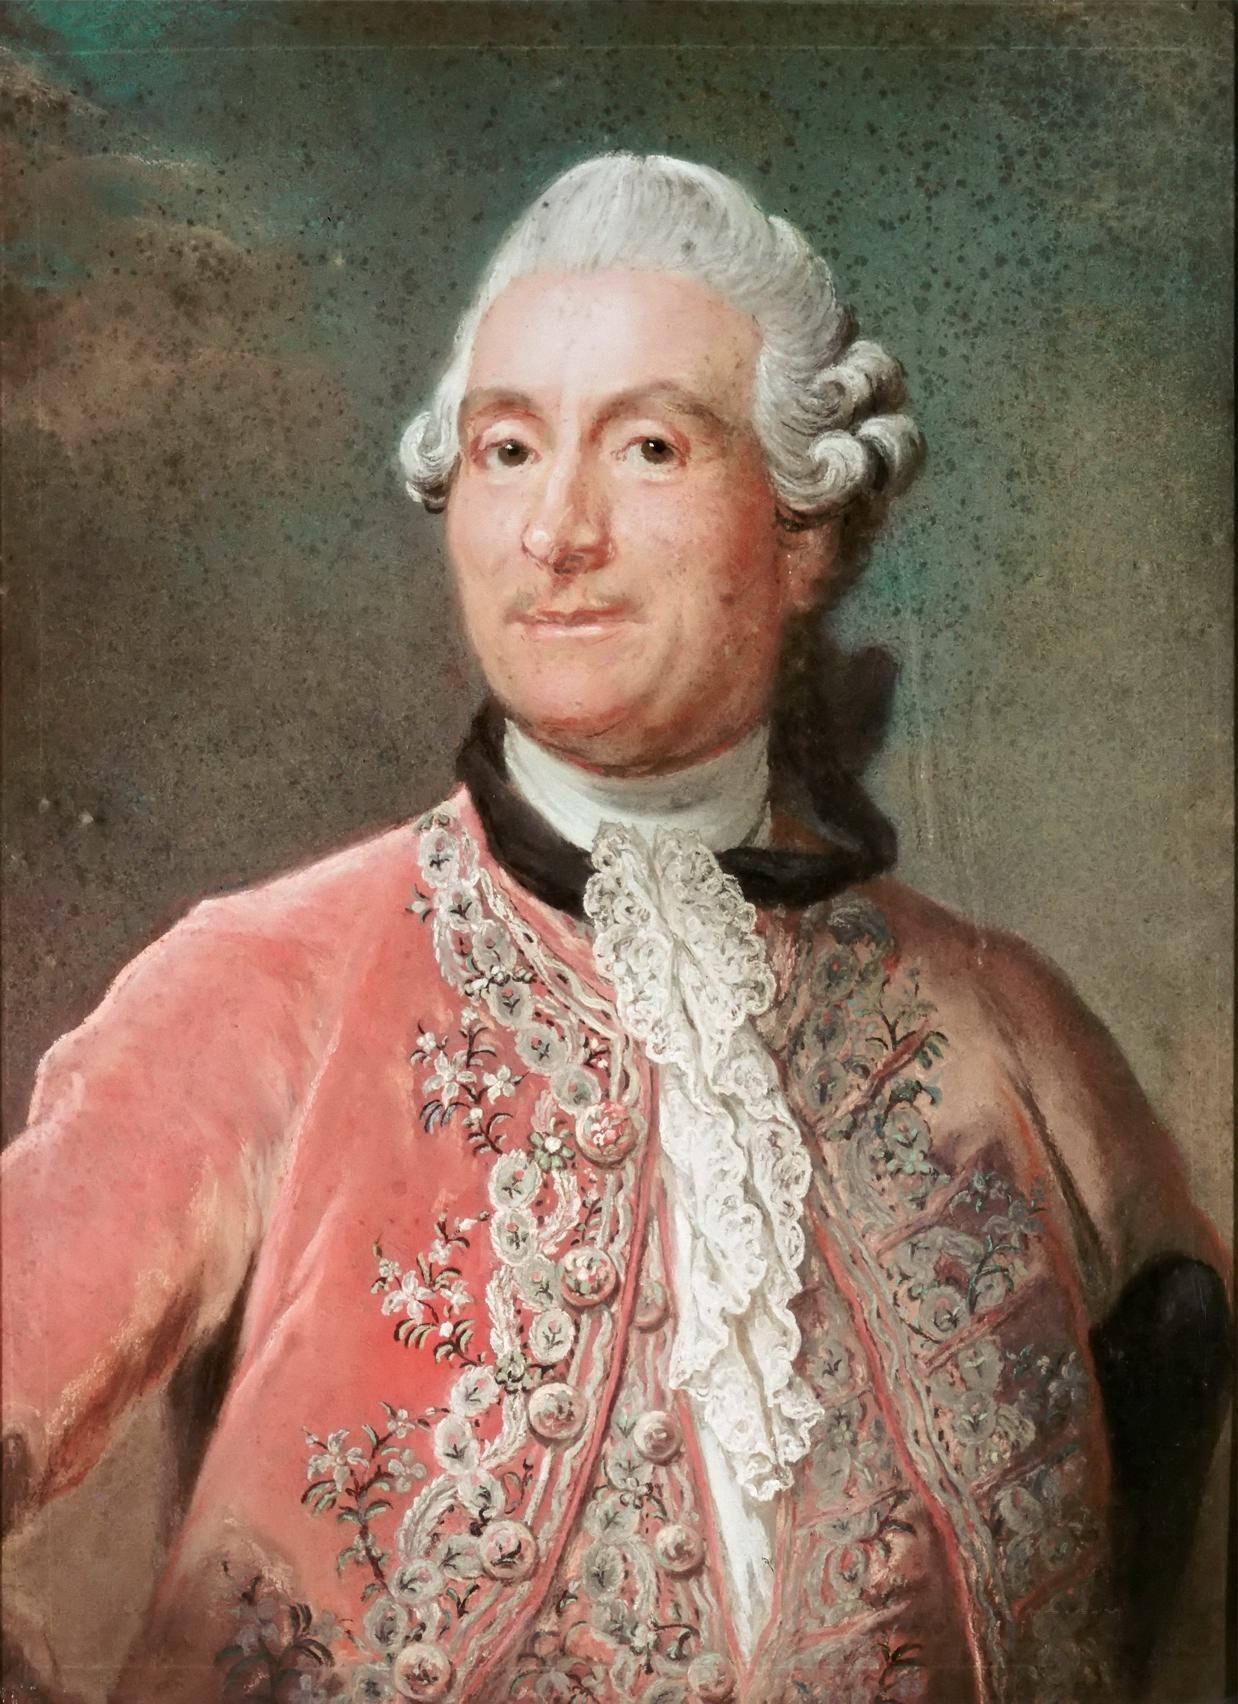 Billedresultat for 18th century portrait pink male